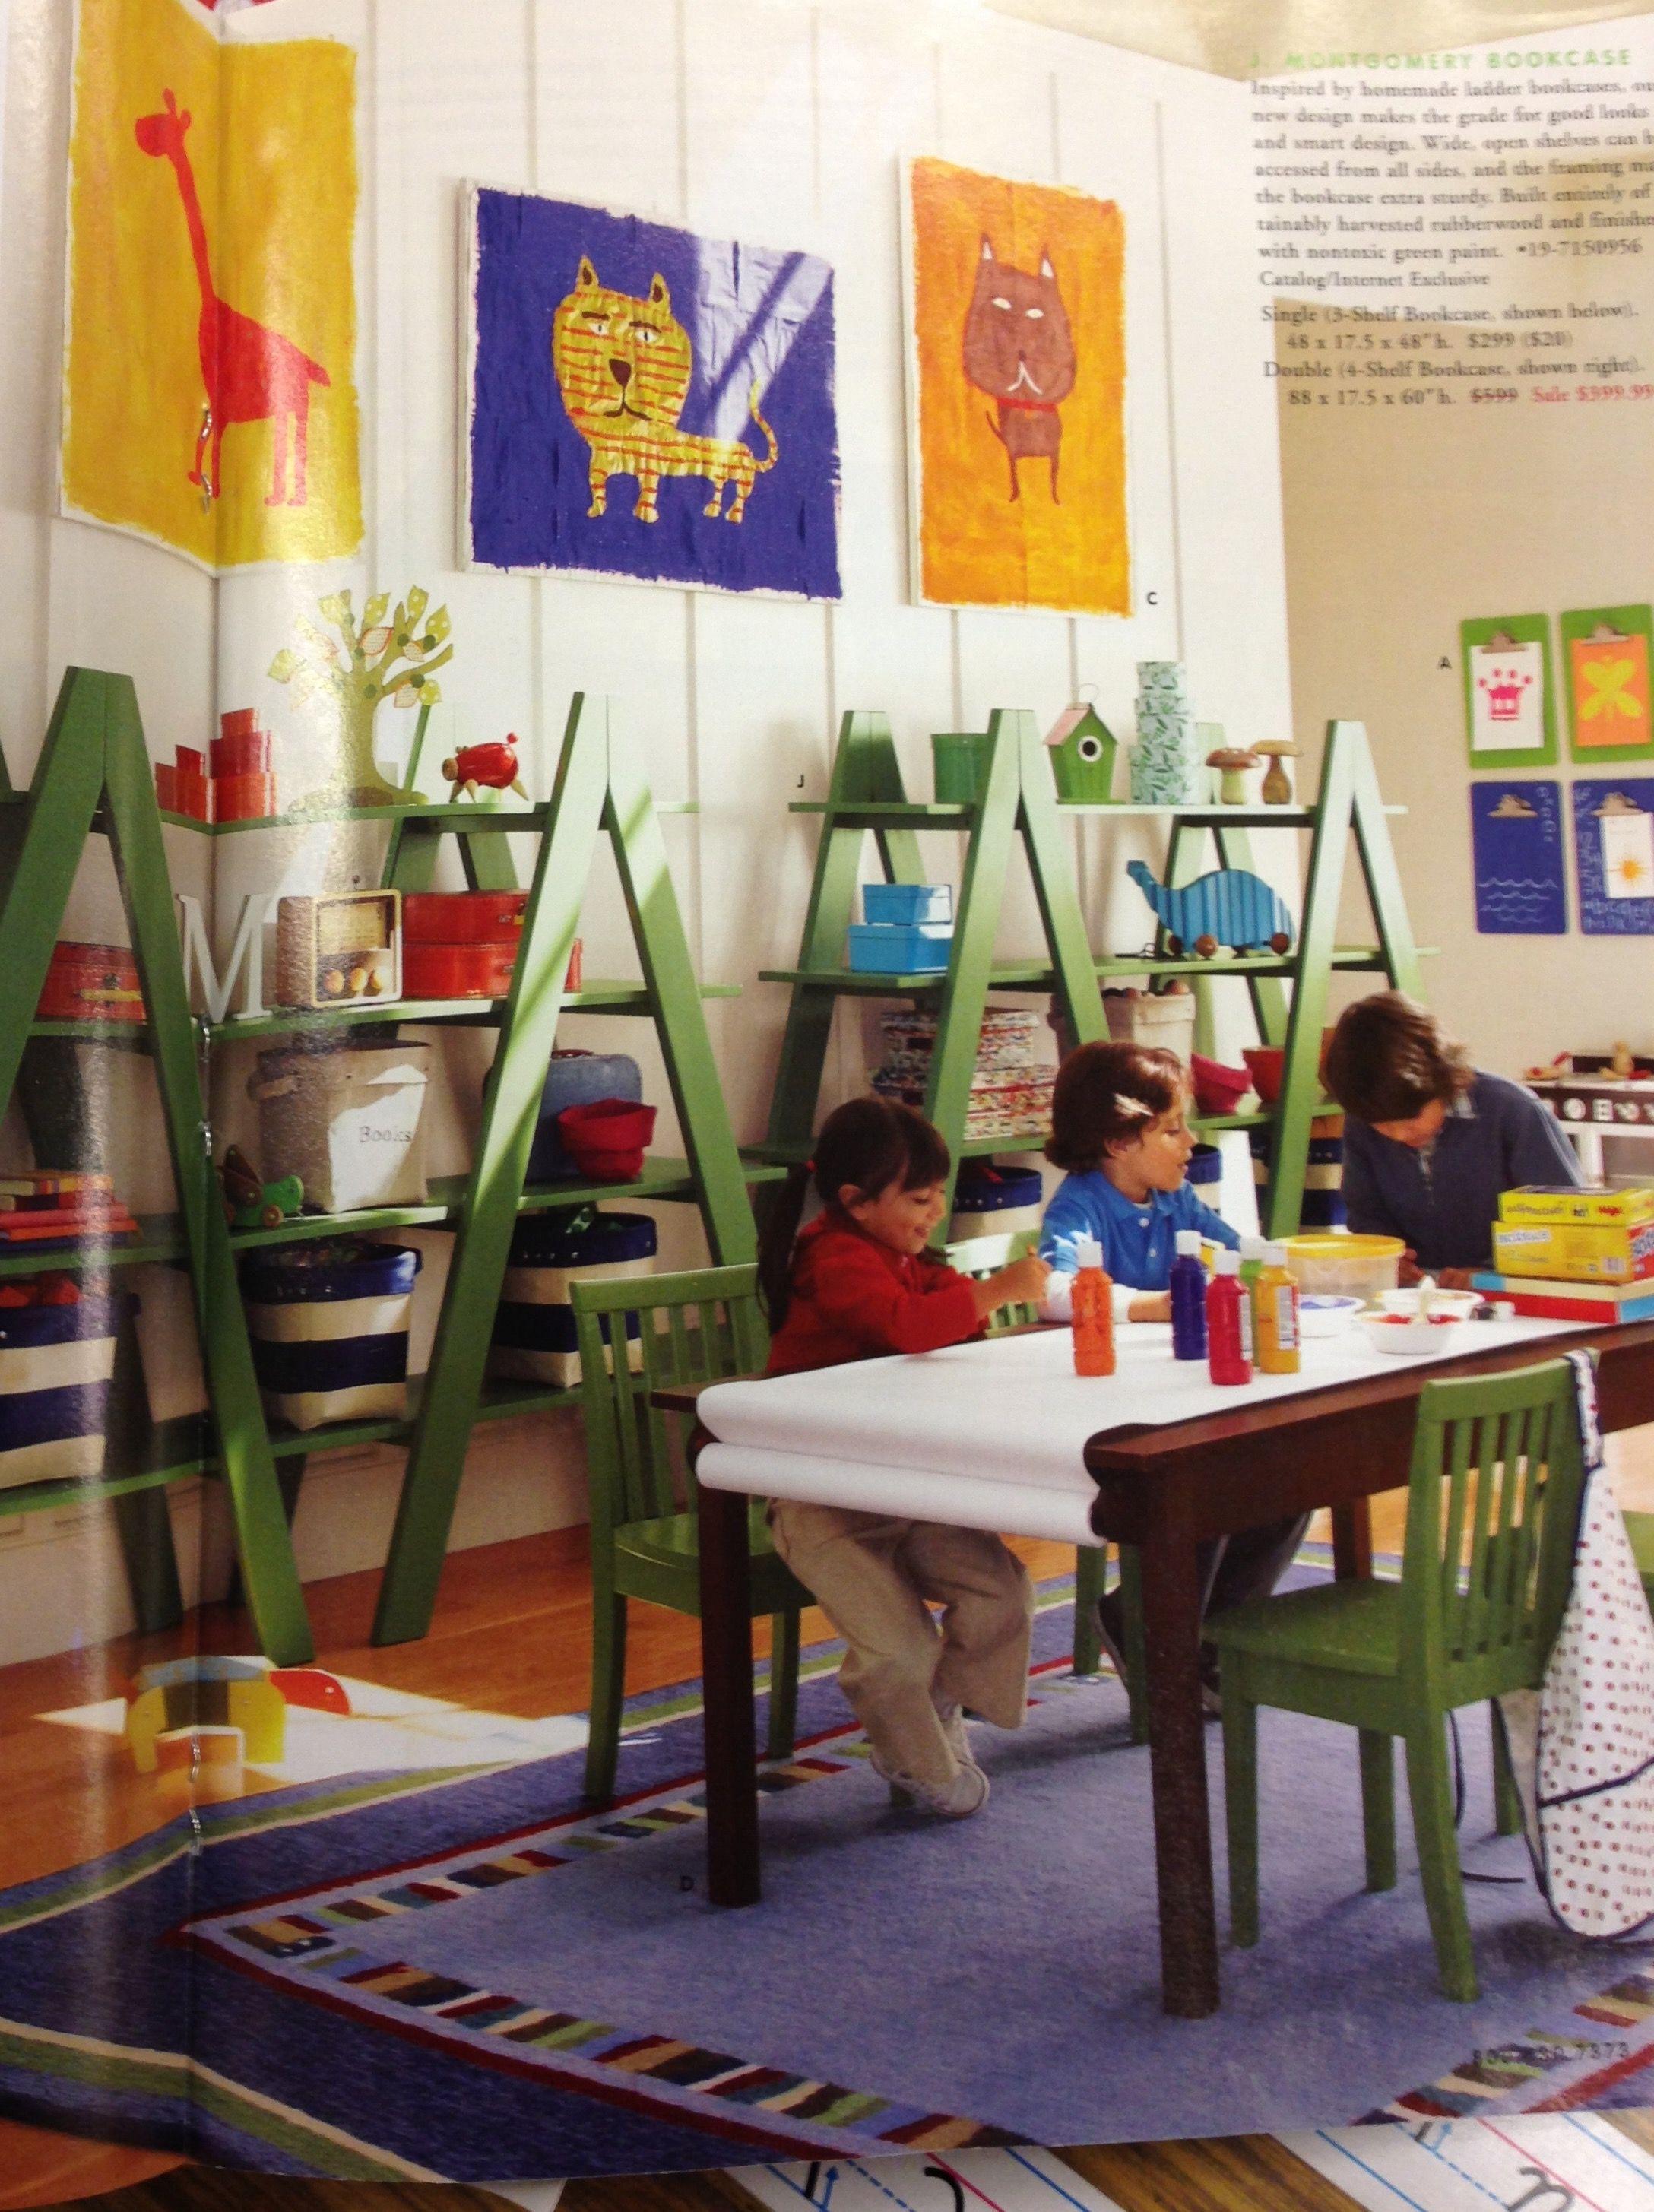 Loft bed privacy ideas  Pin by Amelia Nicolaus on school classroom organization  Pinterest